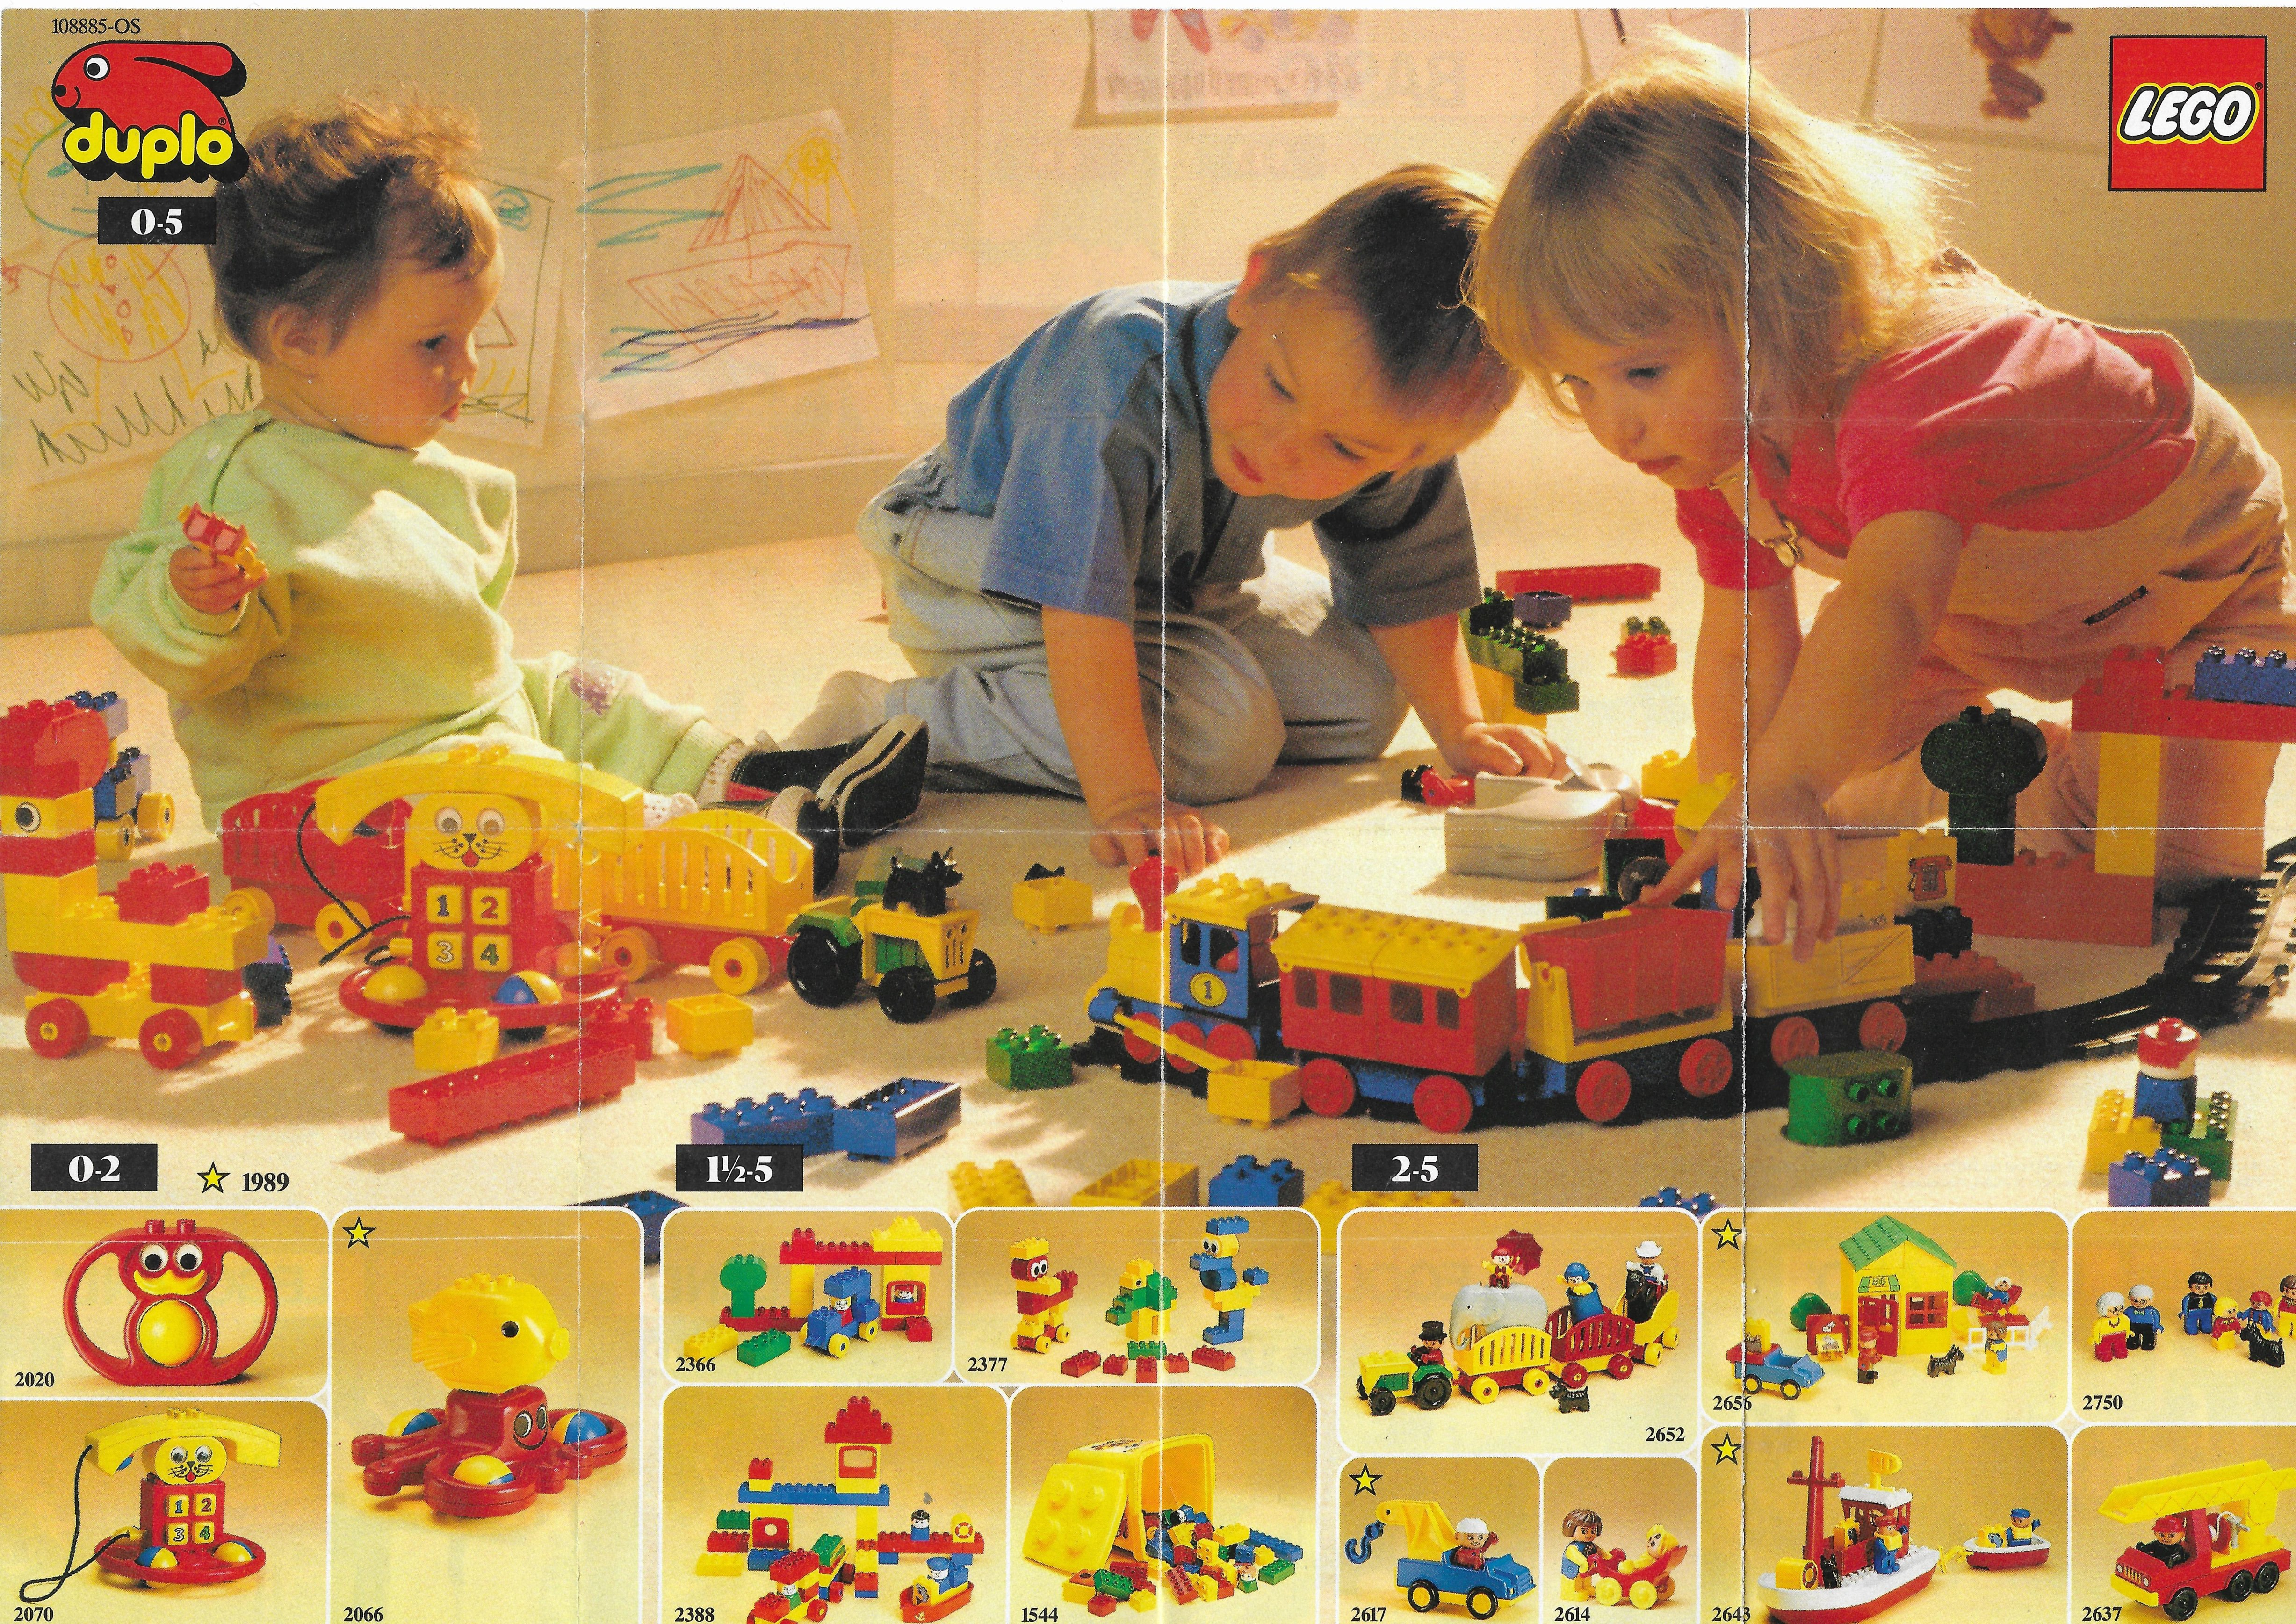 1989-es Duplo-s Lego insert